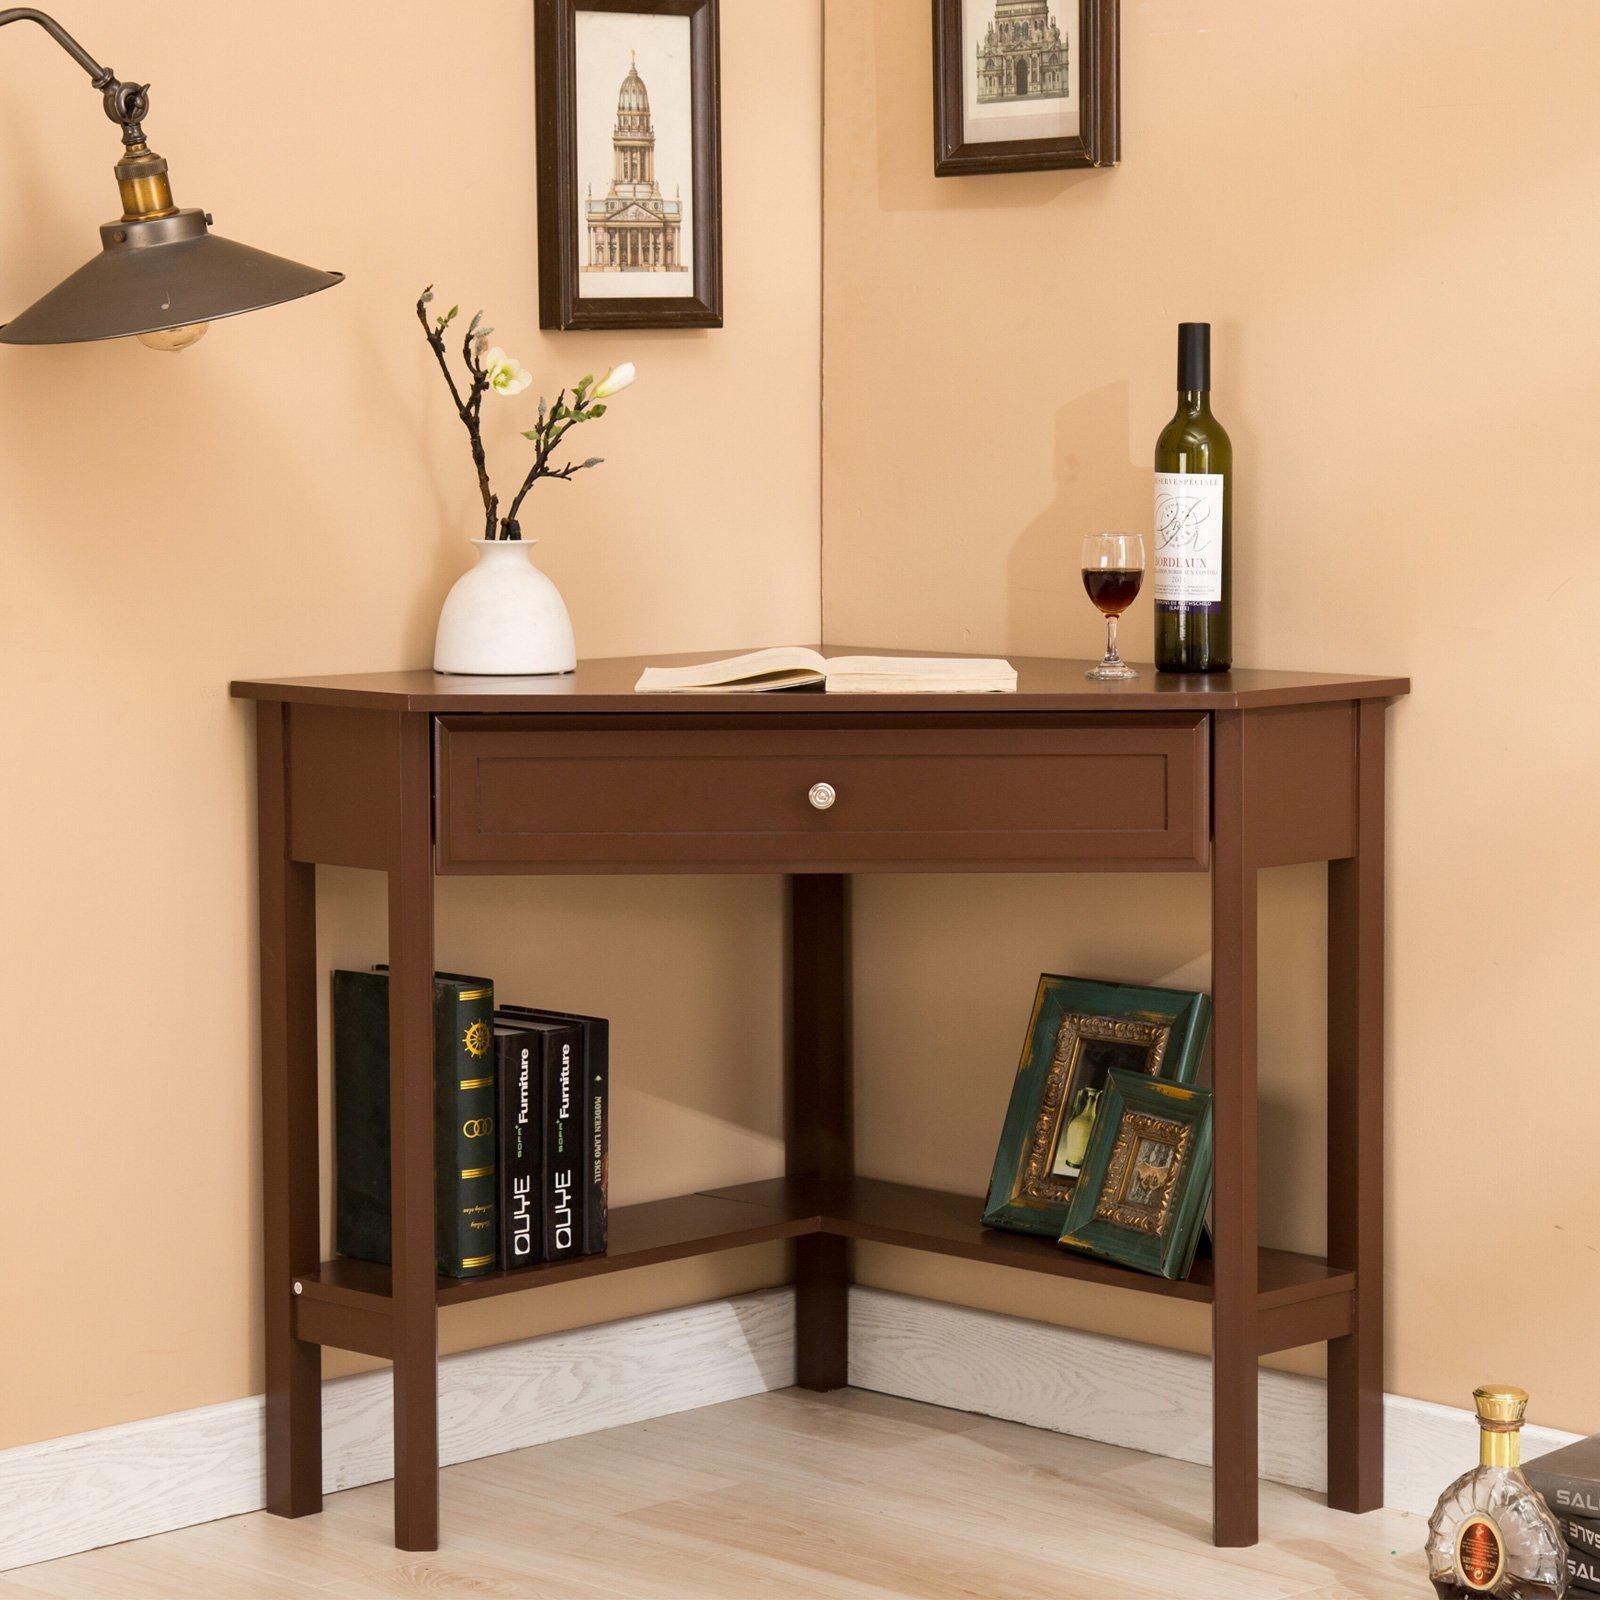 Mecor Espresso Corner Computer Desk/Table with Drawer & Shelf-Wood Corner Computer Laptop Desk for Writing, Work etc-Home Office Use